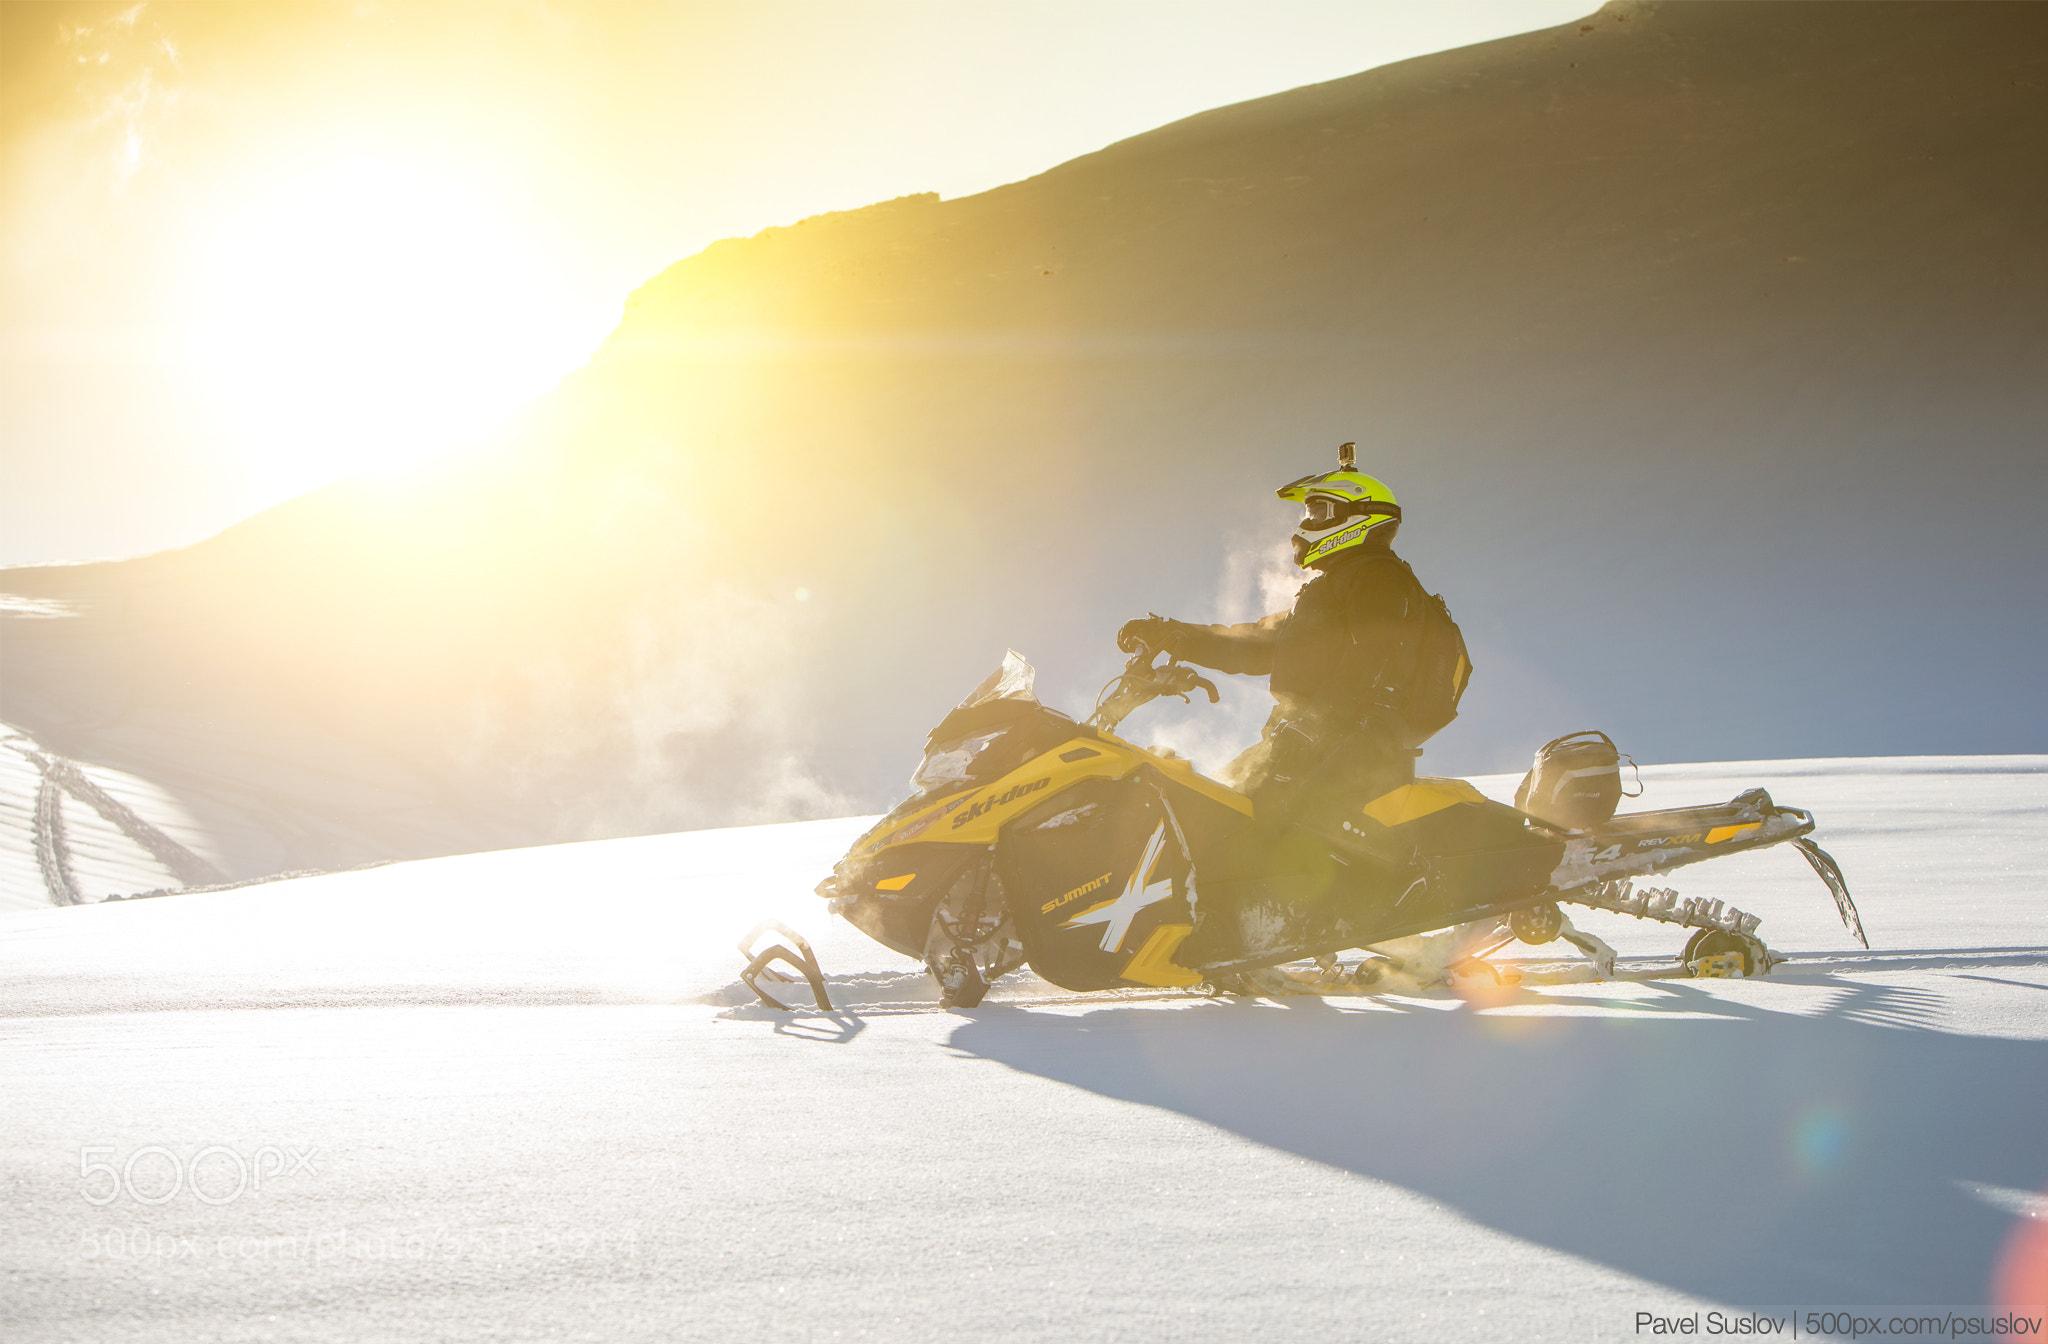 "Photograph Ski Doo Summit 154"" by Pavel Suslov on 500px"